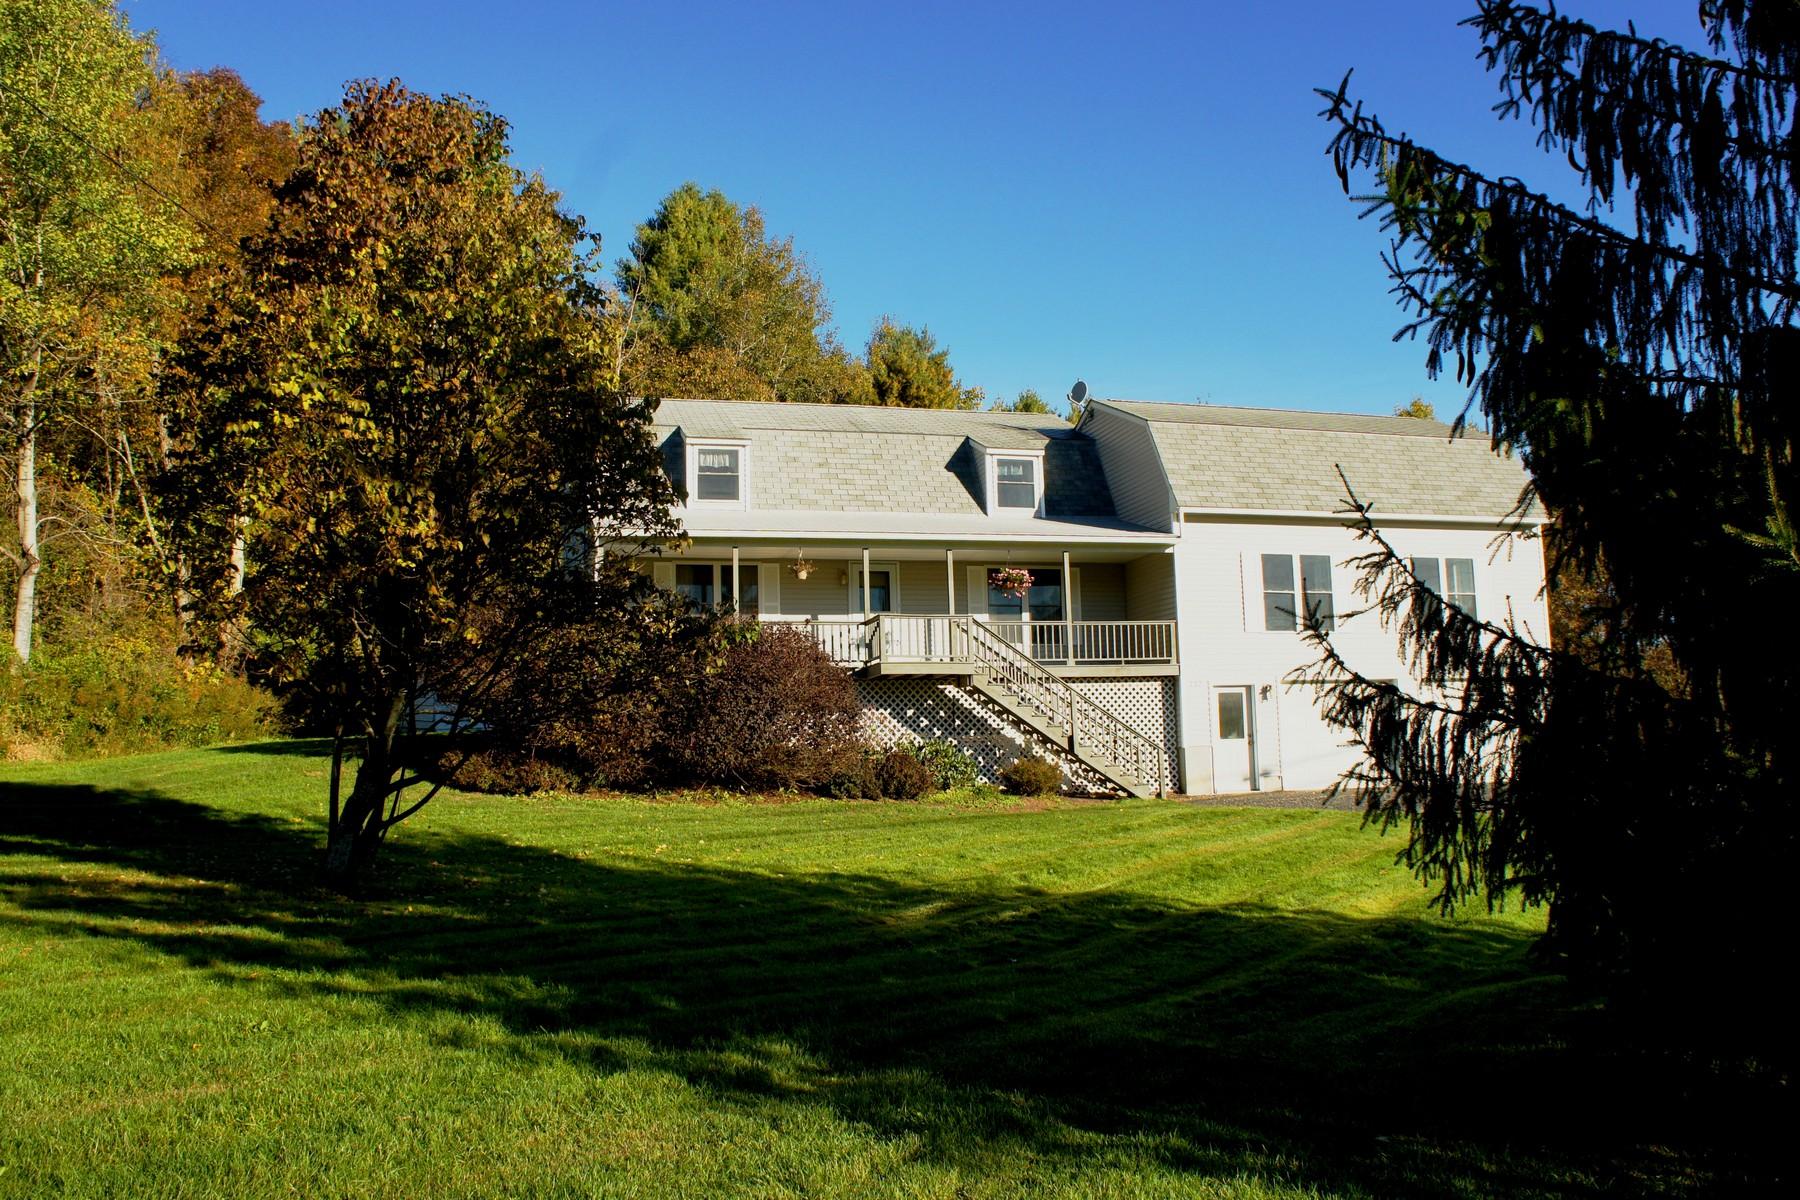 Villa per Vendita alle ore 737 Guptil Rd, Waterbury Waterbury, Vermont 05676 Stati Uniti